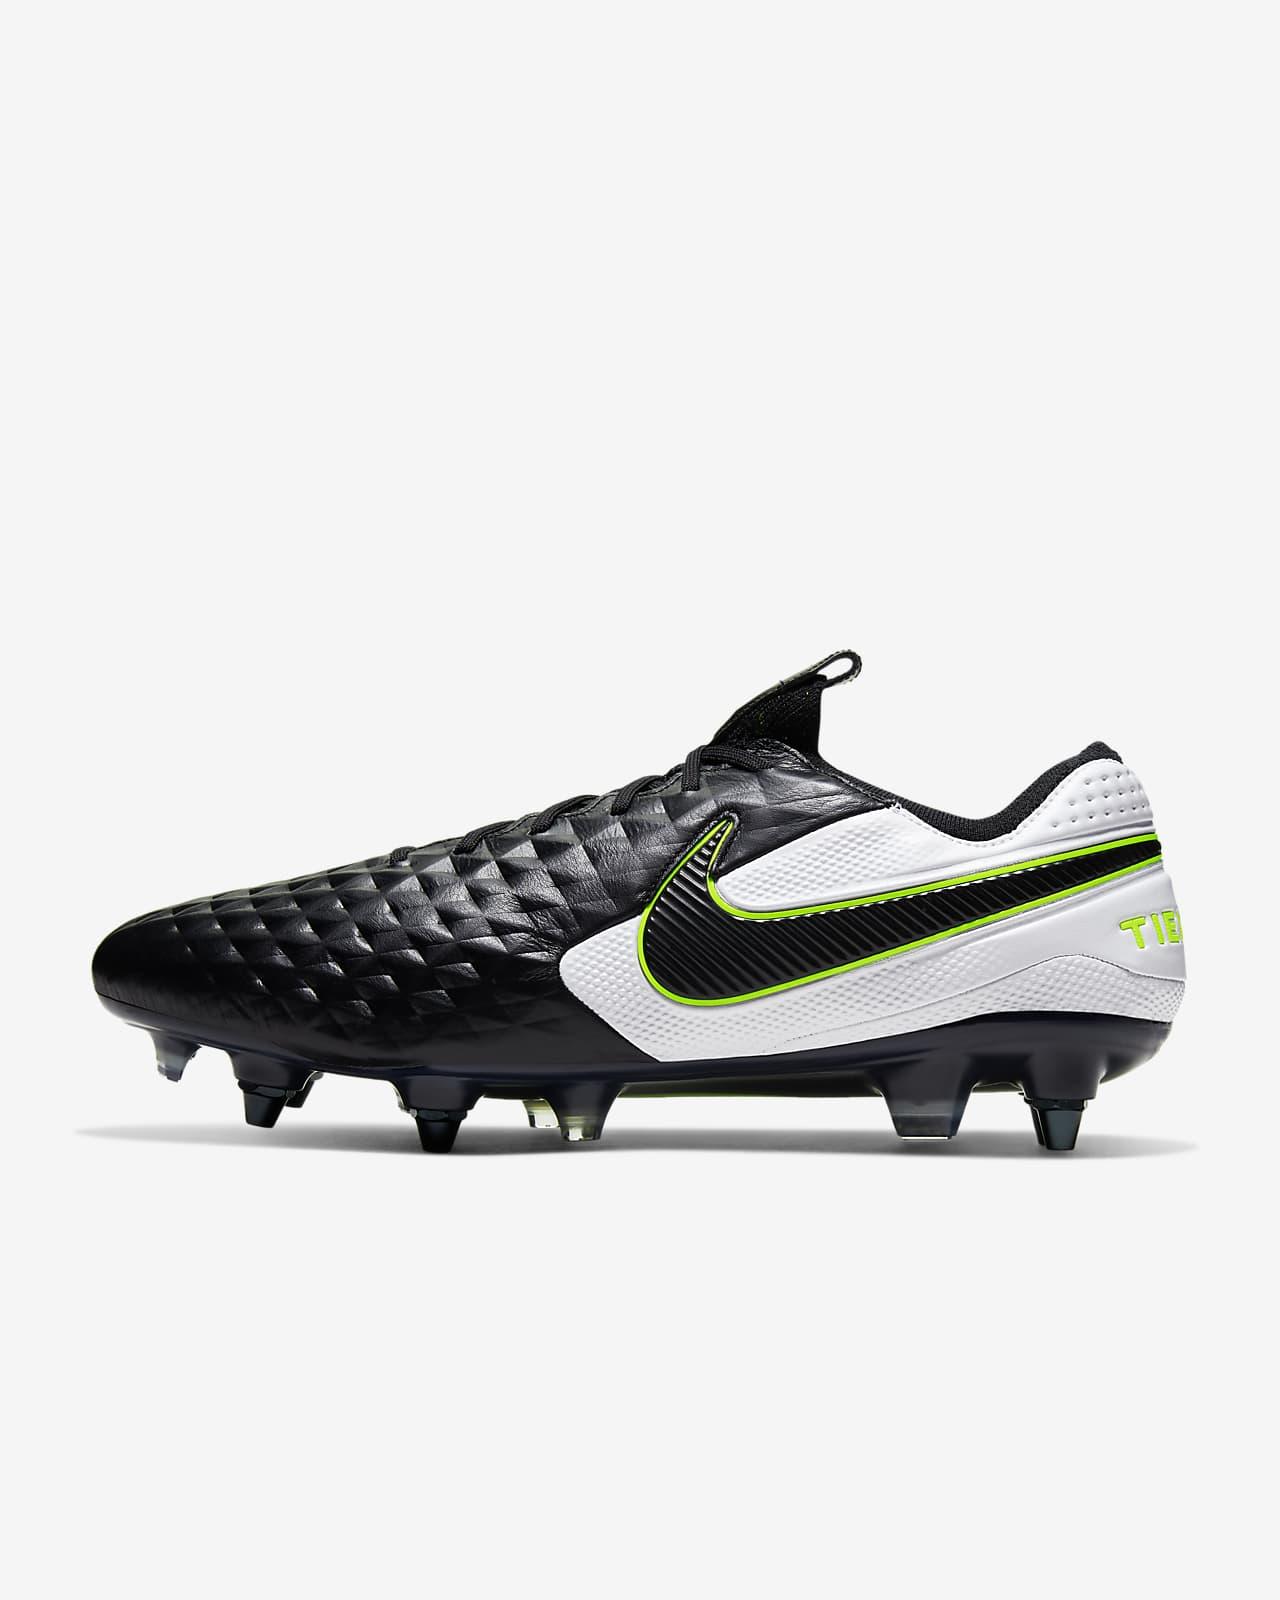 pastor Pertenecer a grosor  Nike Tiempo Legend 8 Elite SG-PRO Anti-Clog Traction Soft-Ground Football  Boot. Nike IE